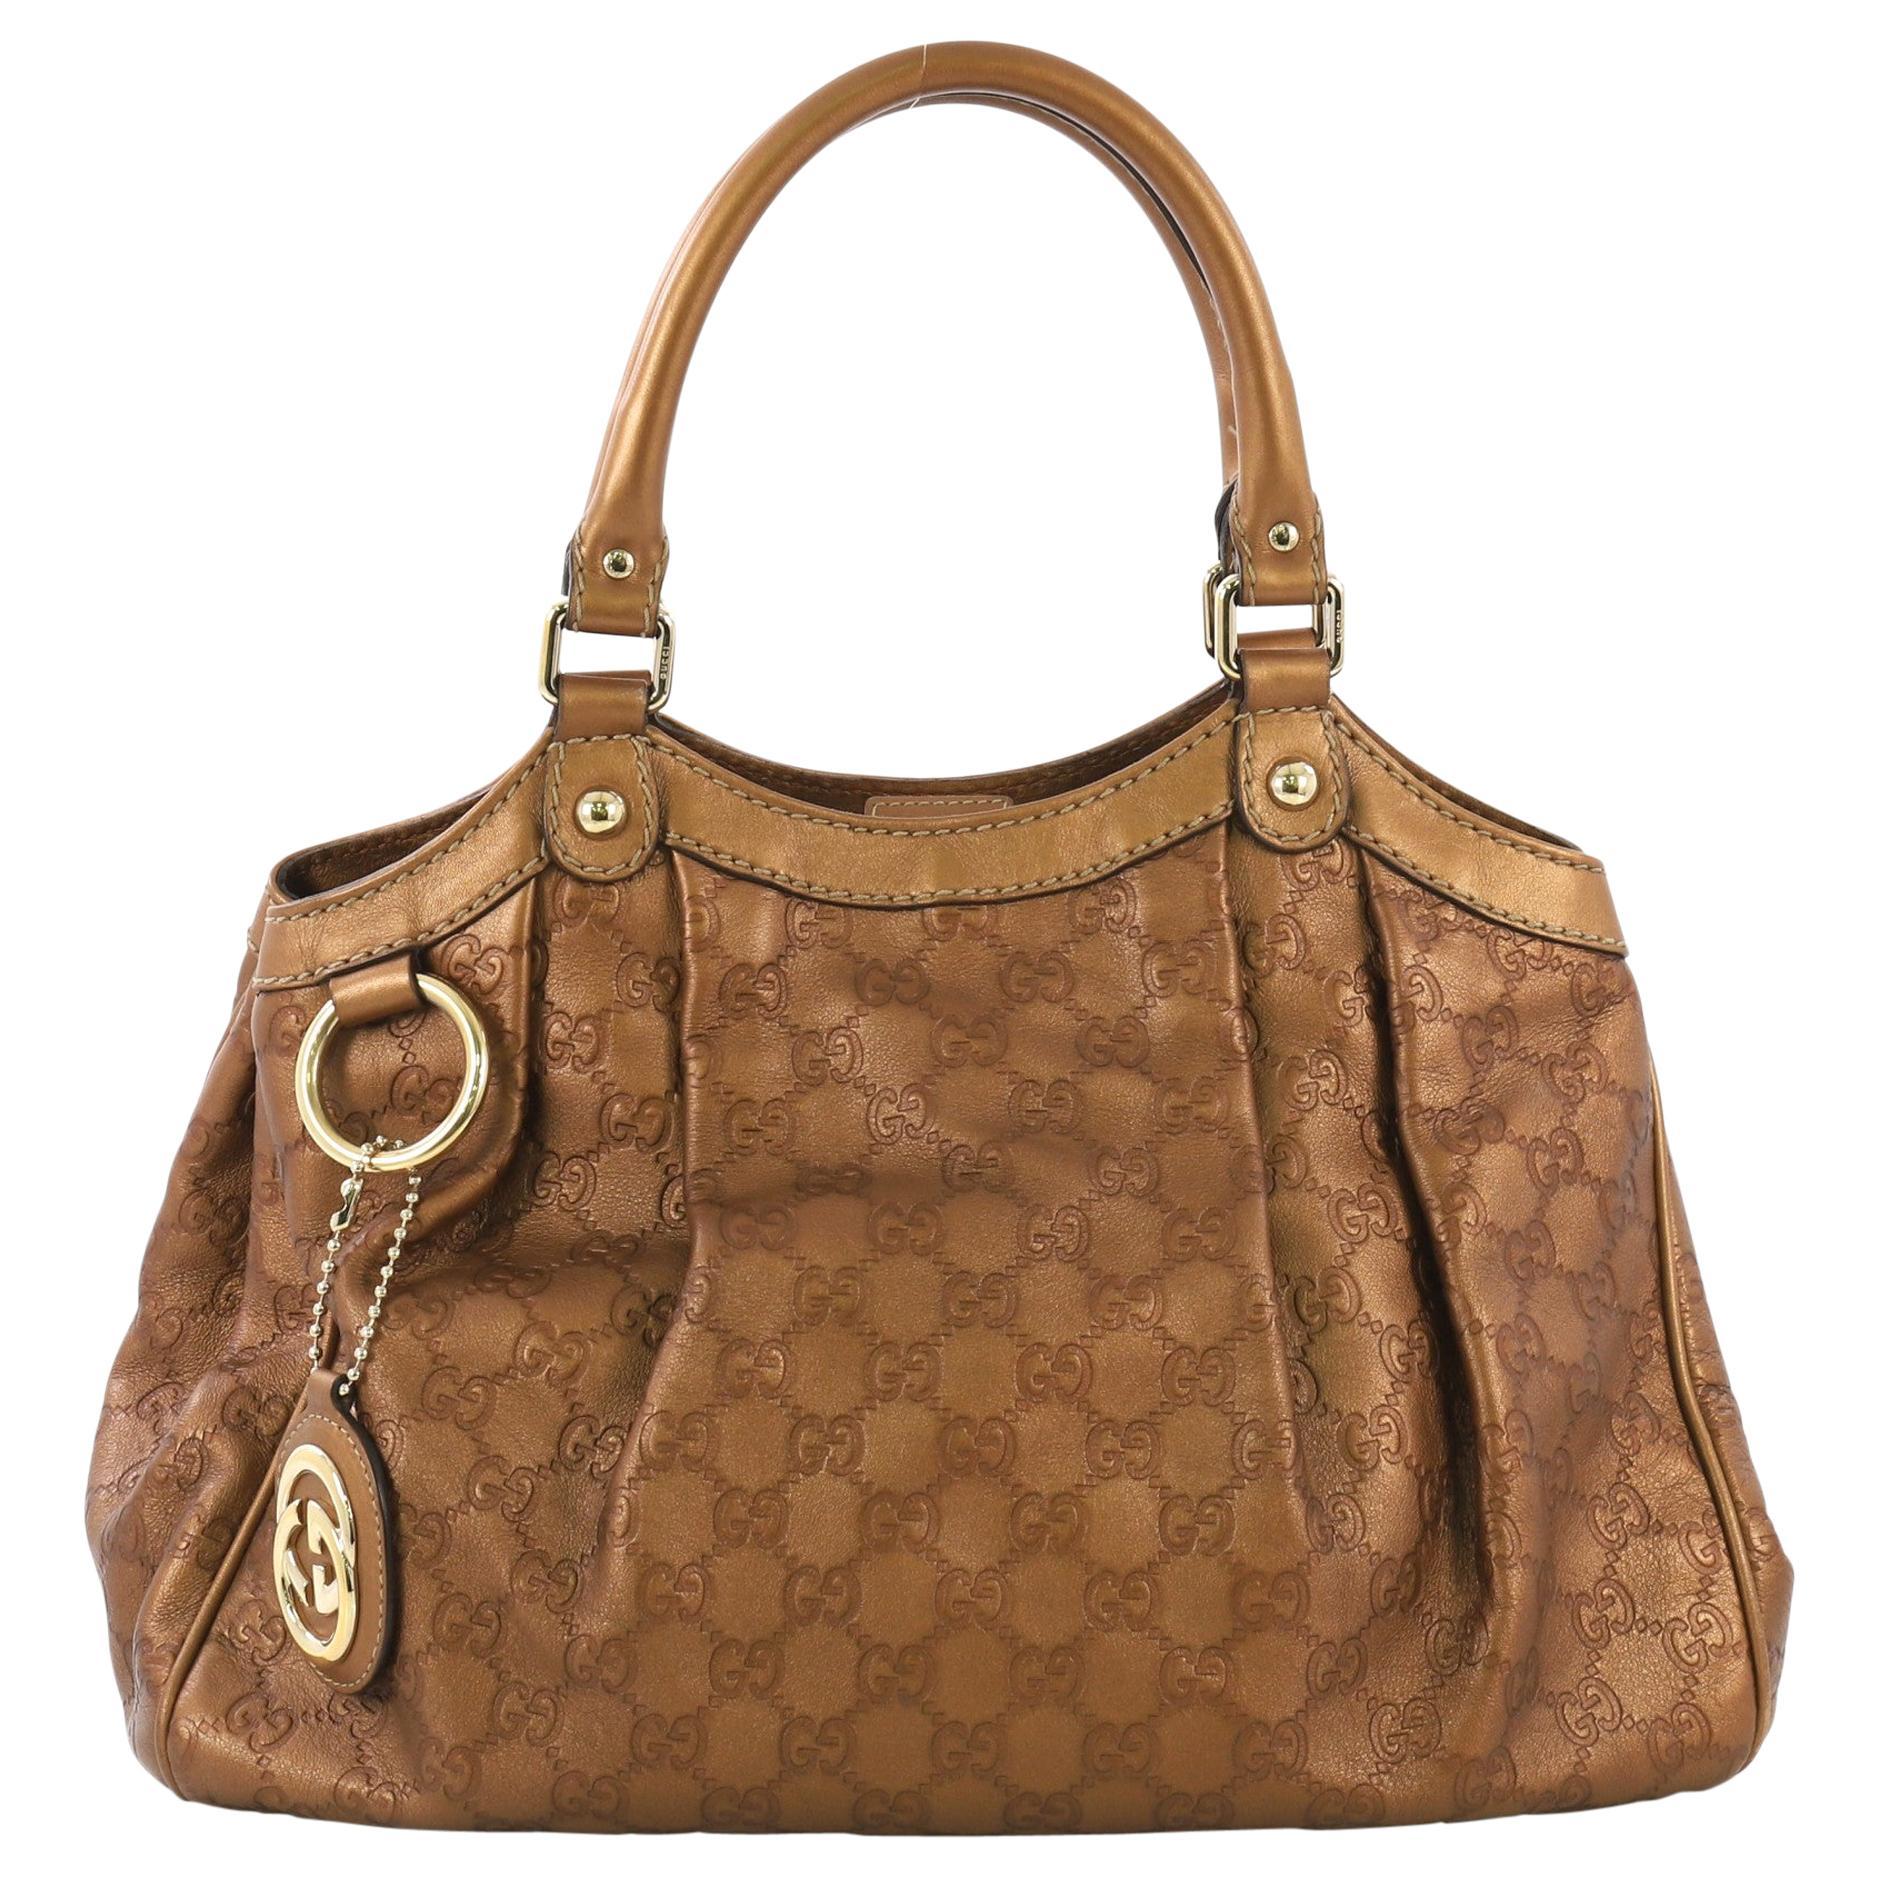 75e34cf3ff0c Vintage Gucci Handbags and Purses - 2,046 For Sale at 1stdibs